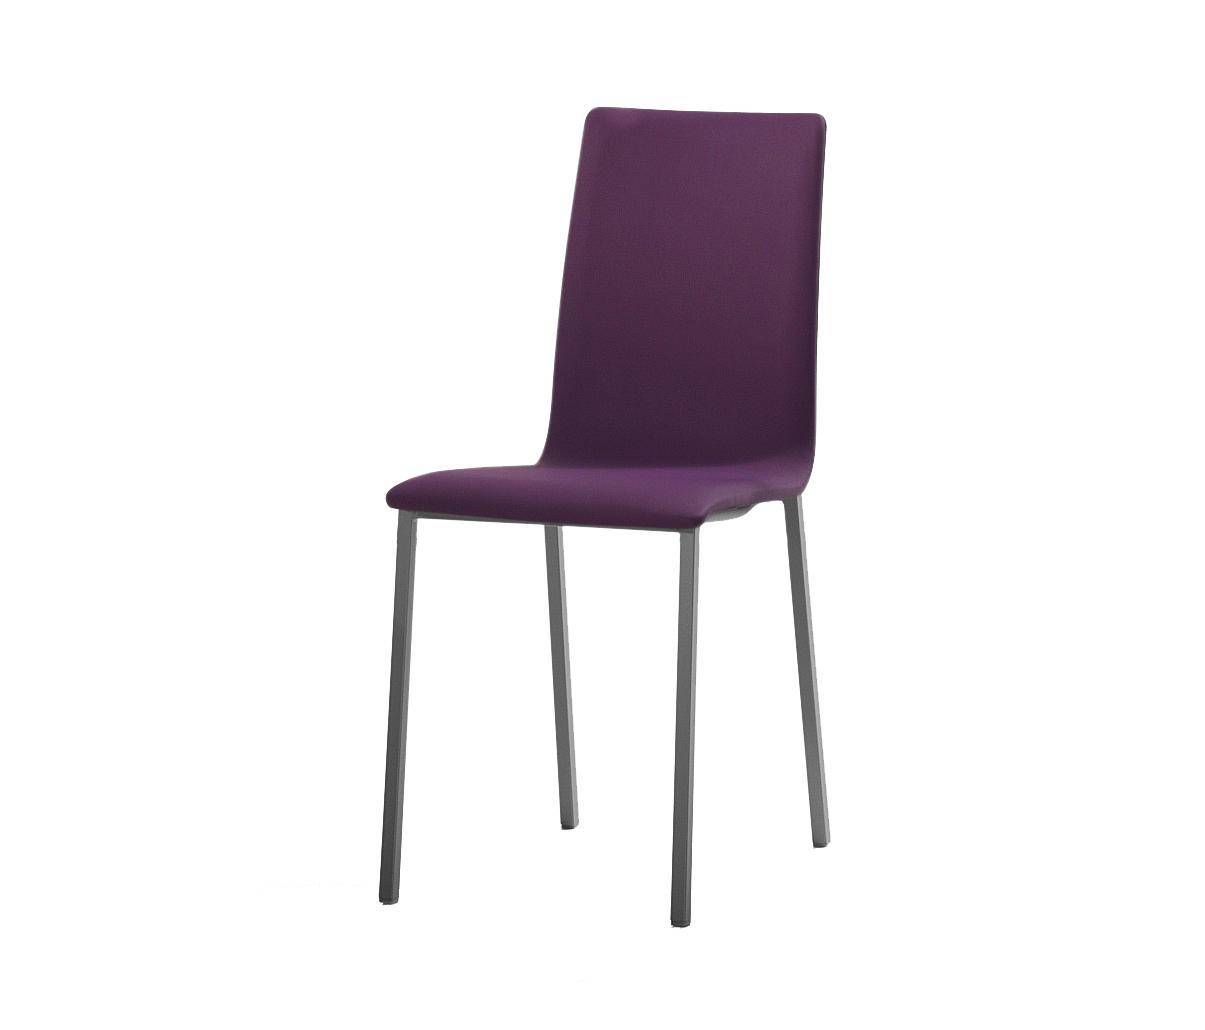 Charmant Koko By Mobliberica   Chairs